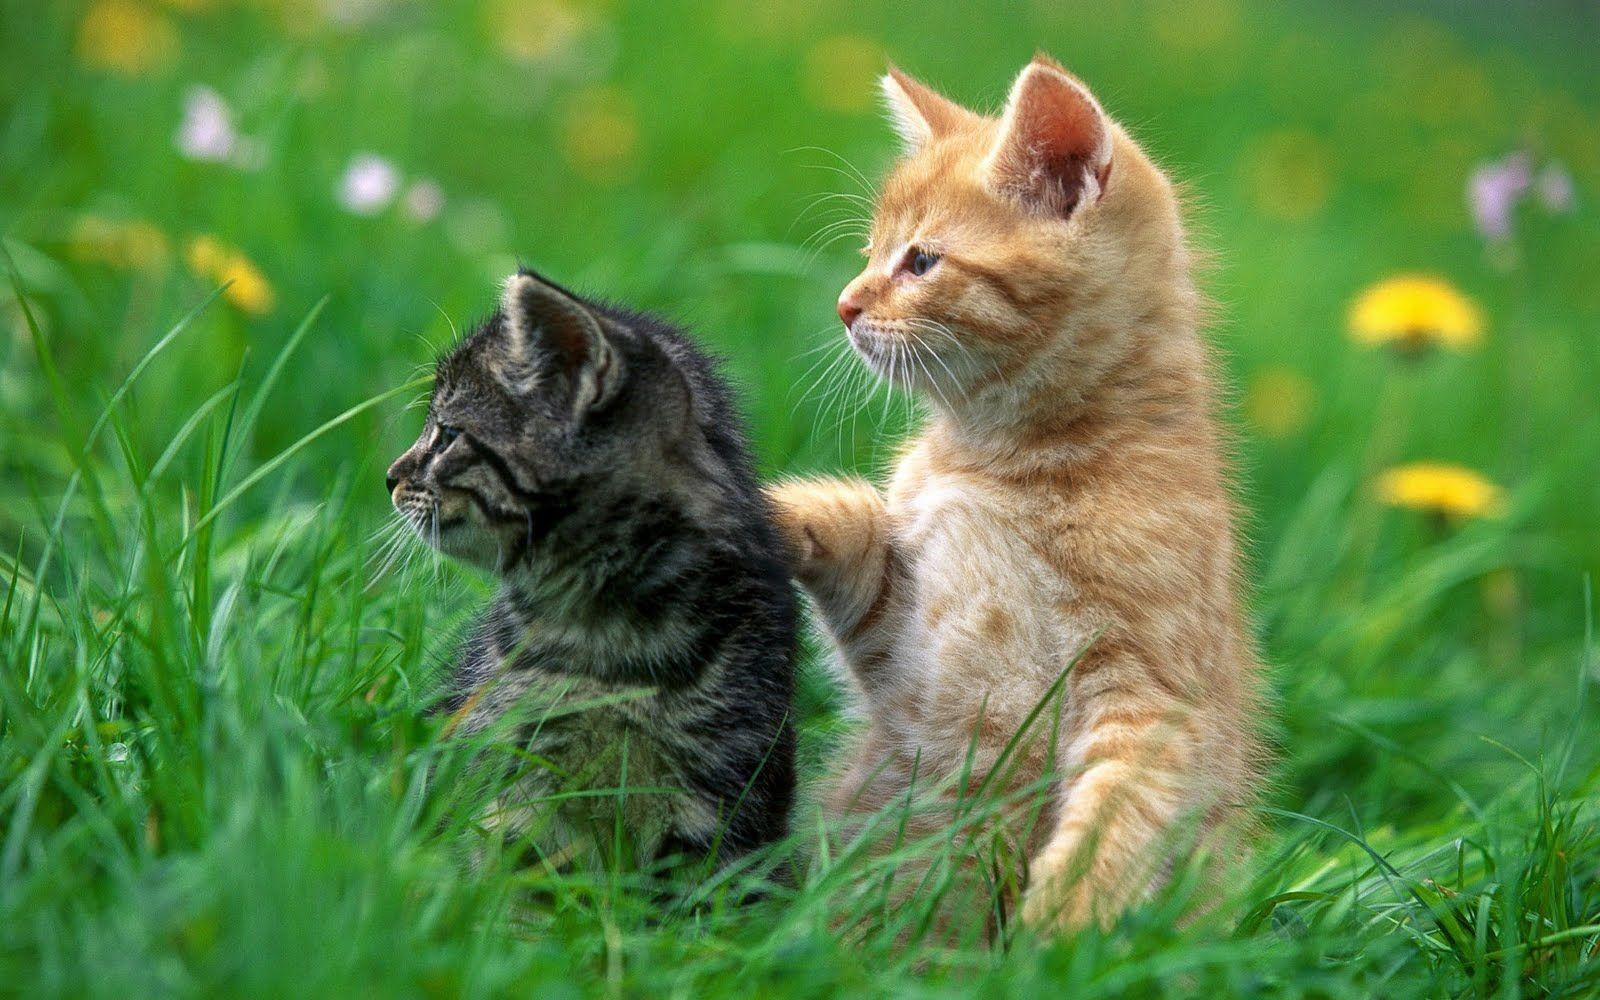 Beautiful Pets Wallpapers 1920x1200 Pixhome Funny Cat Photos